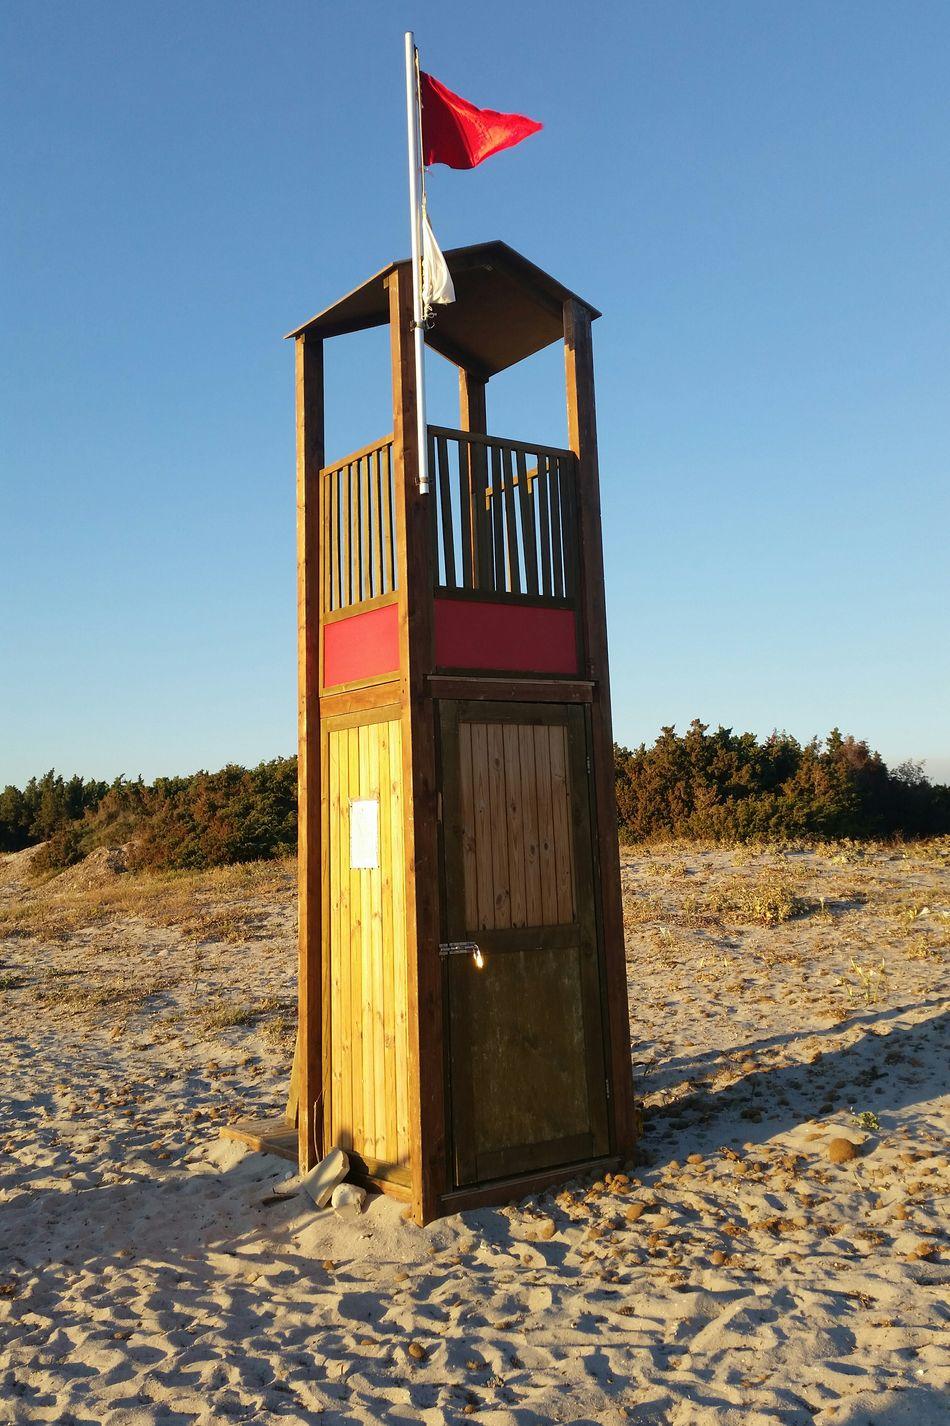 Sea Baywatch Sos Redflag Noone